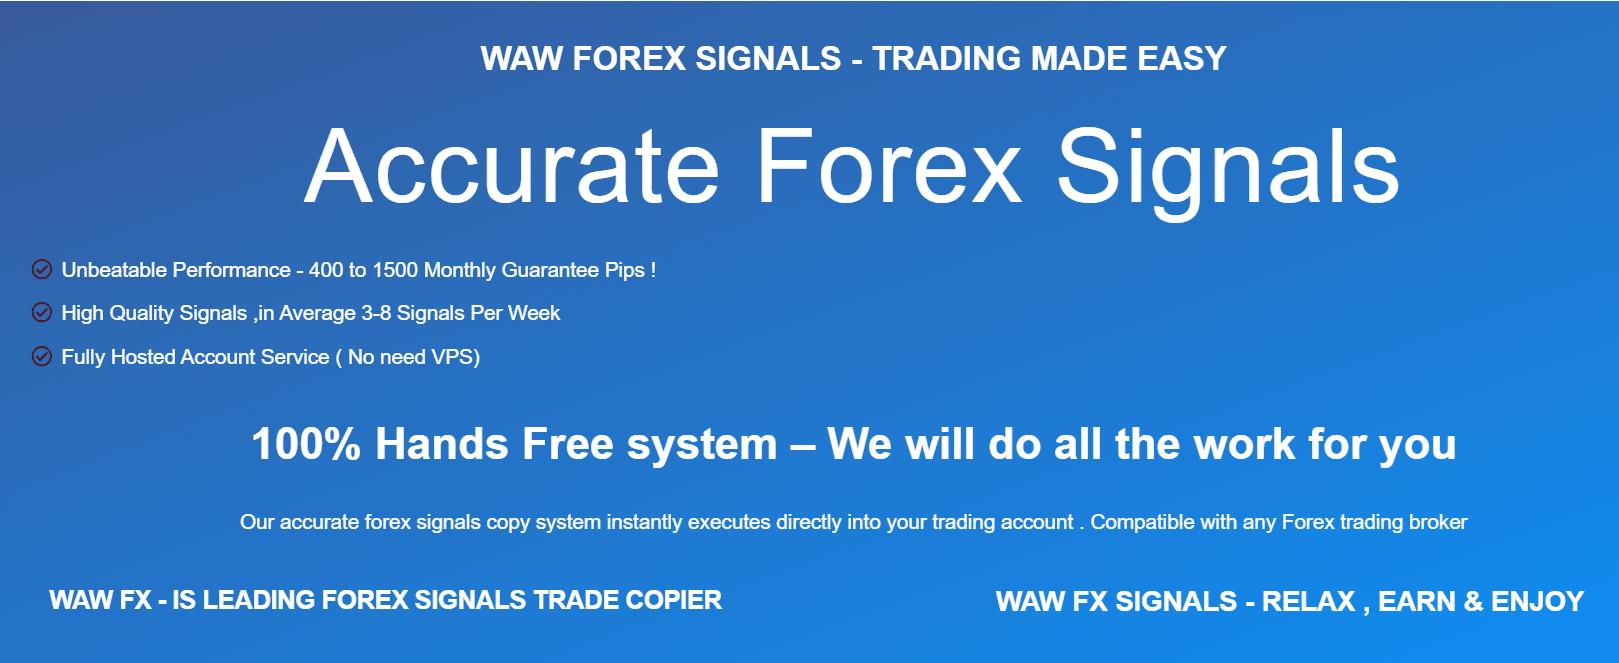 Waw Forex Signals presentation